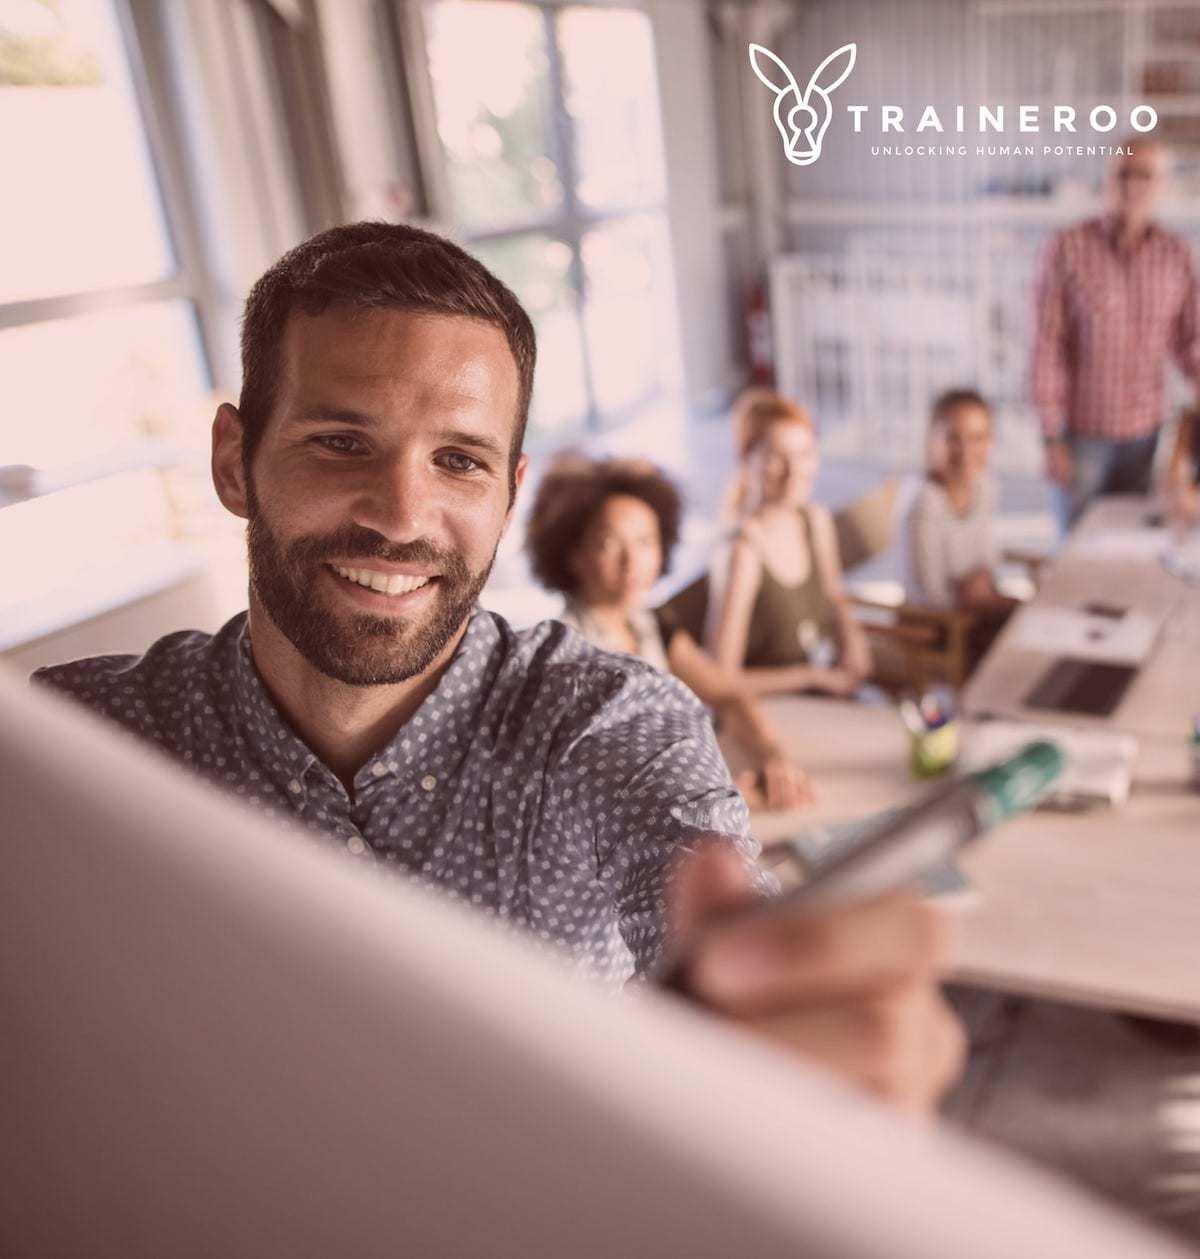 Open Training - Training Traineroo